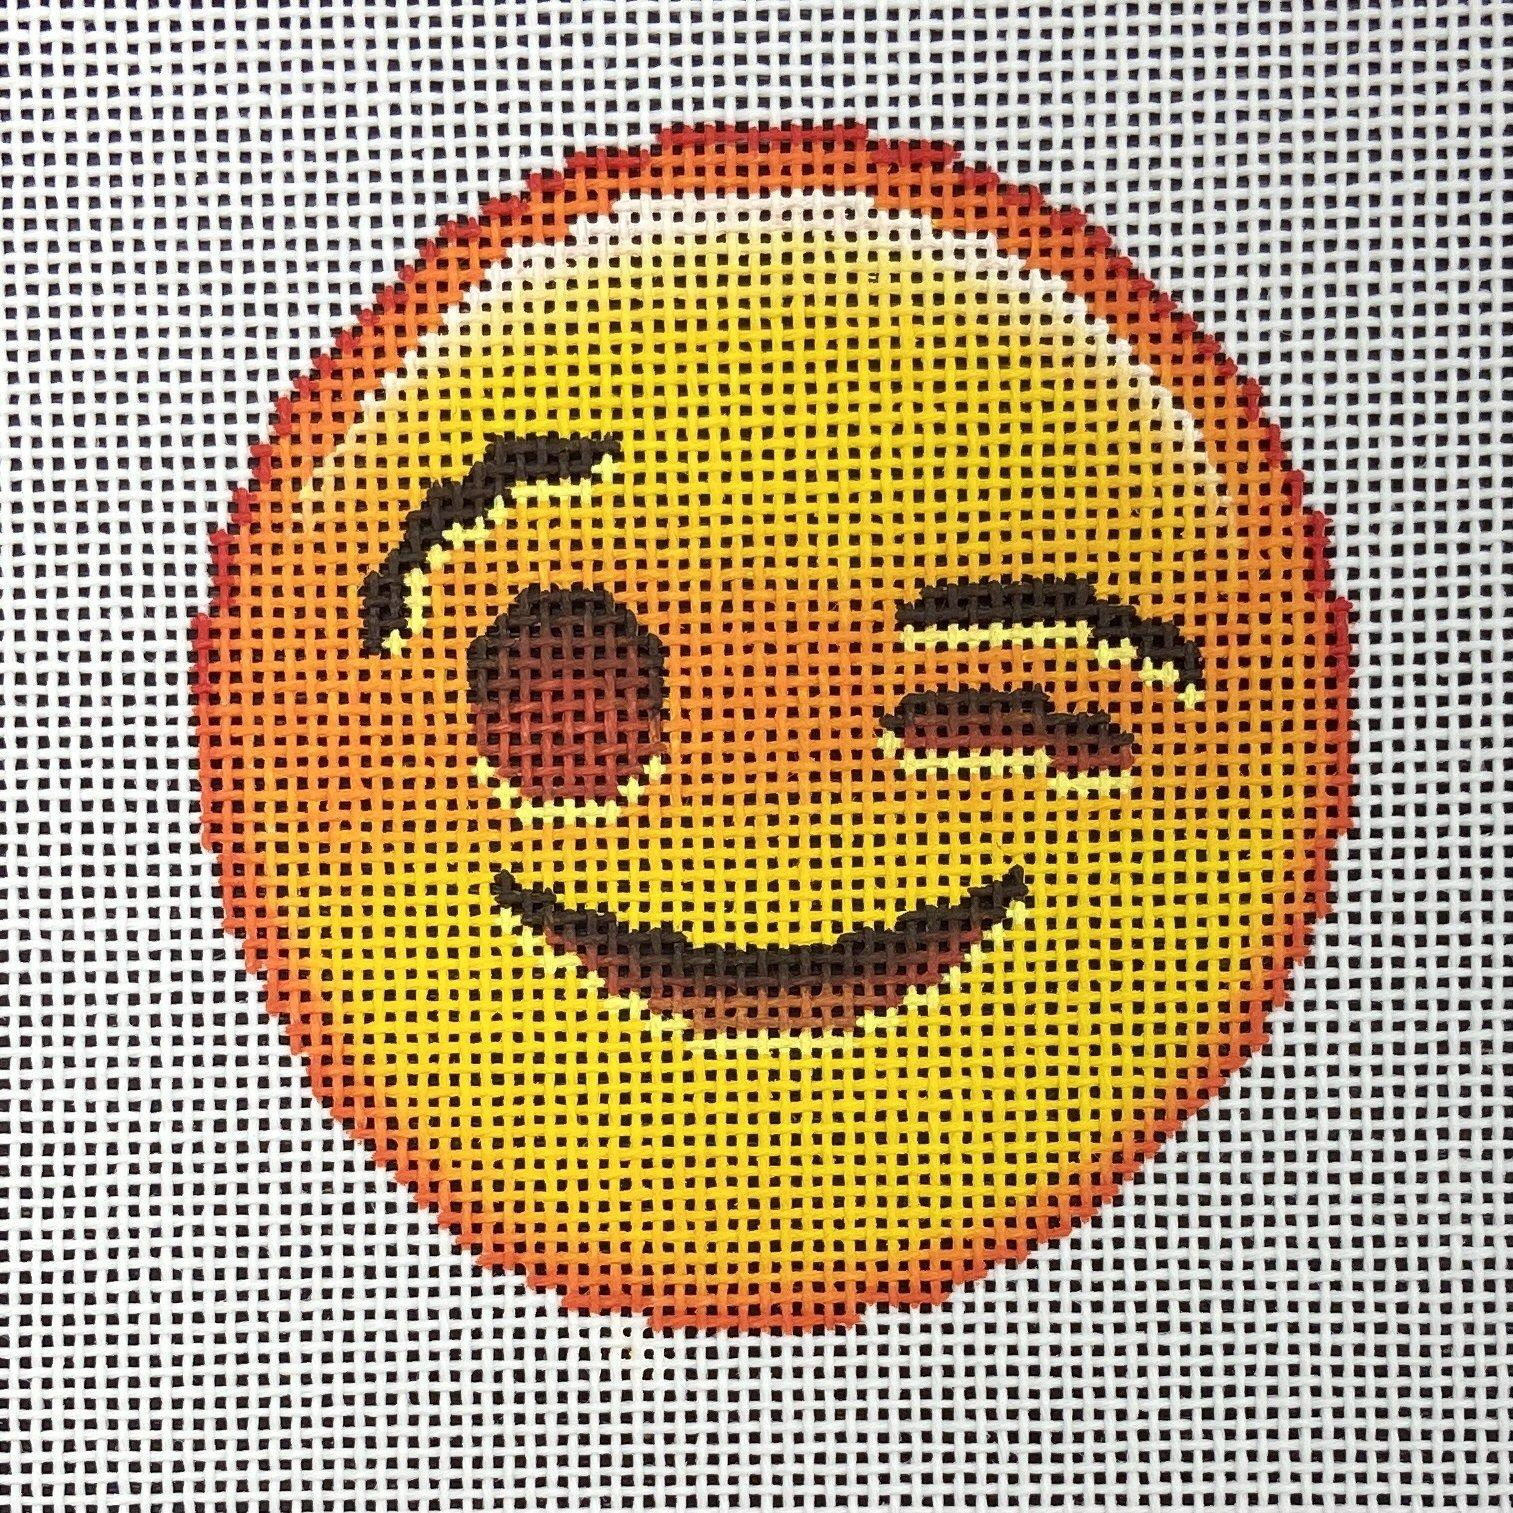 EJ011 Wink Emoji Ornament Point Of It All Designs